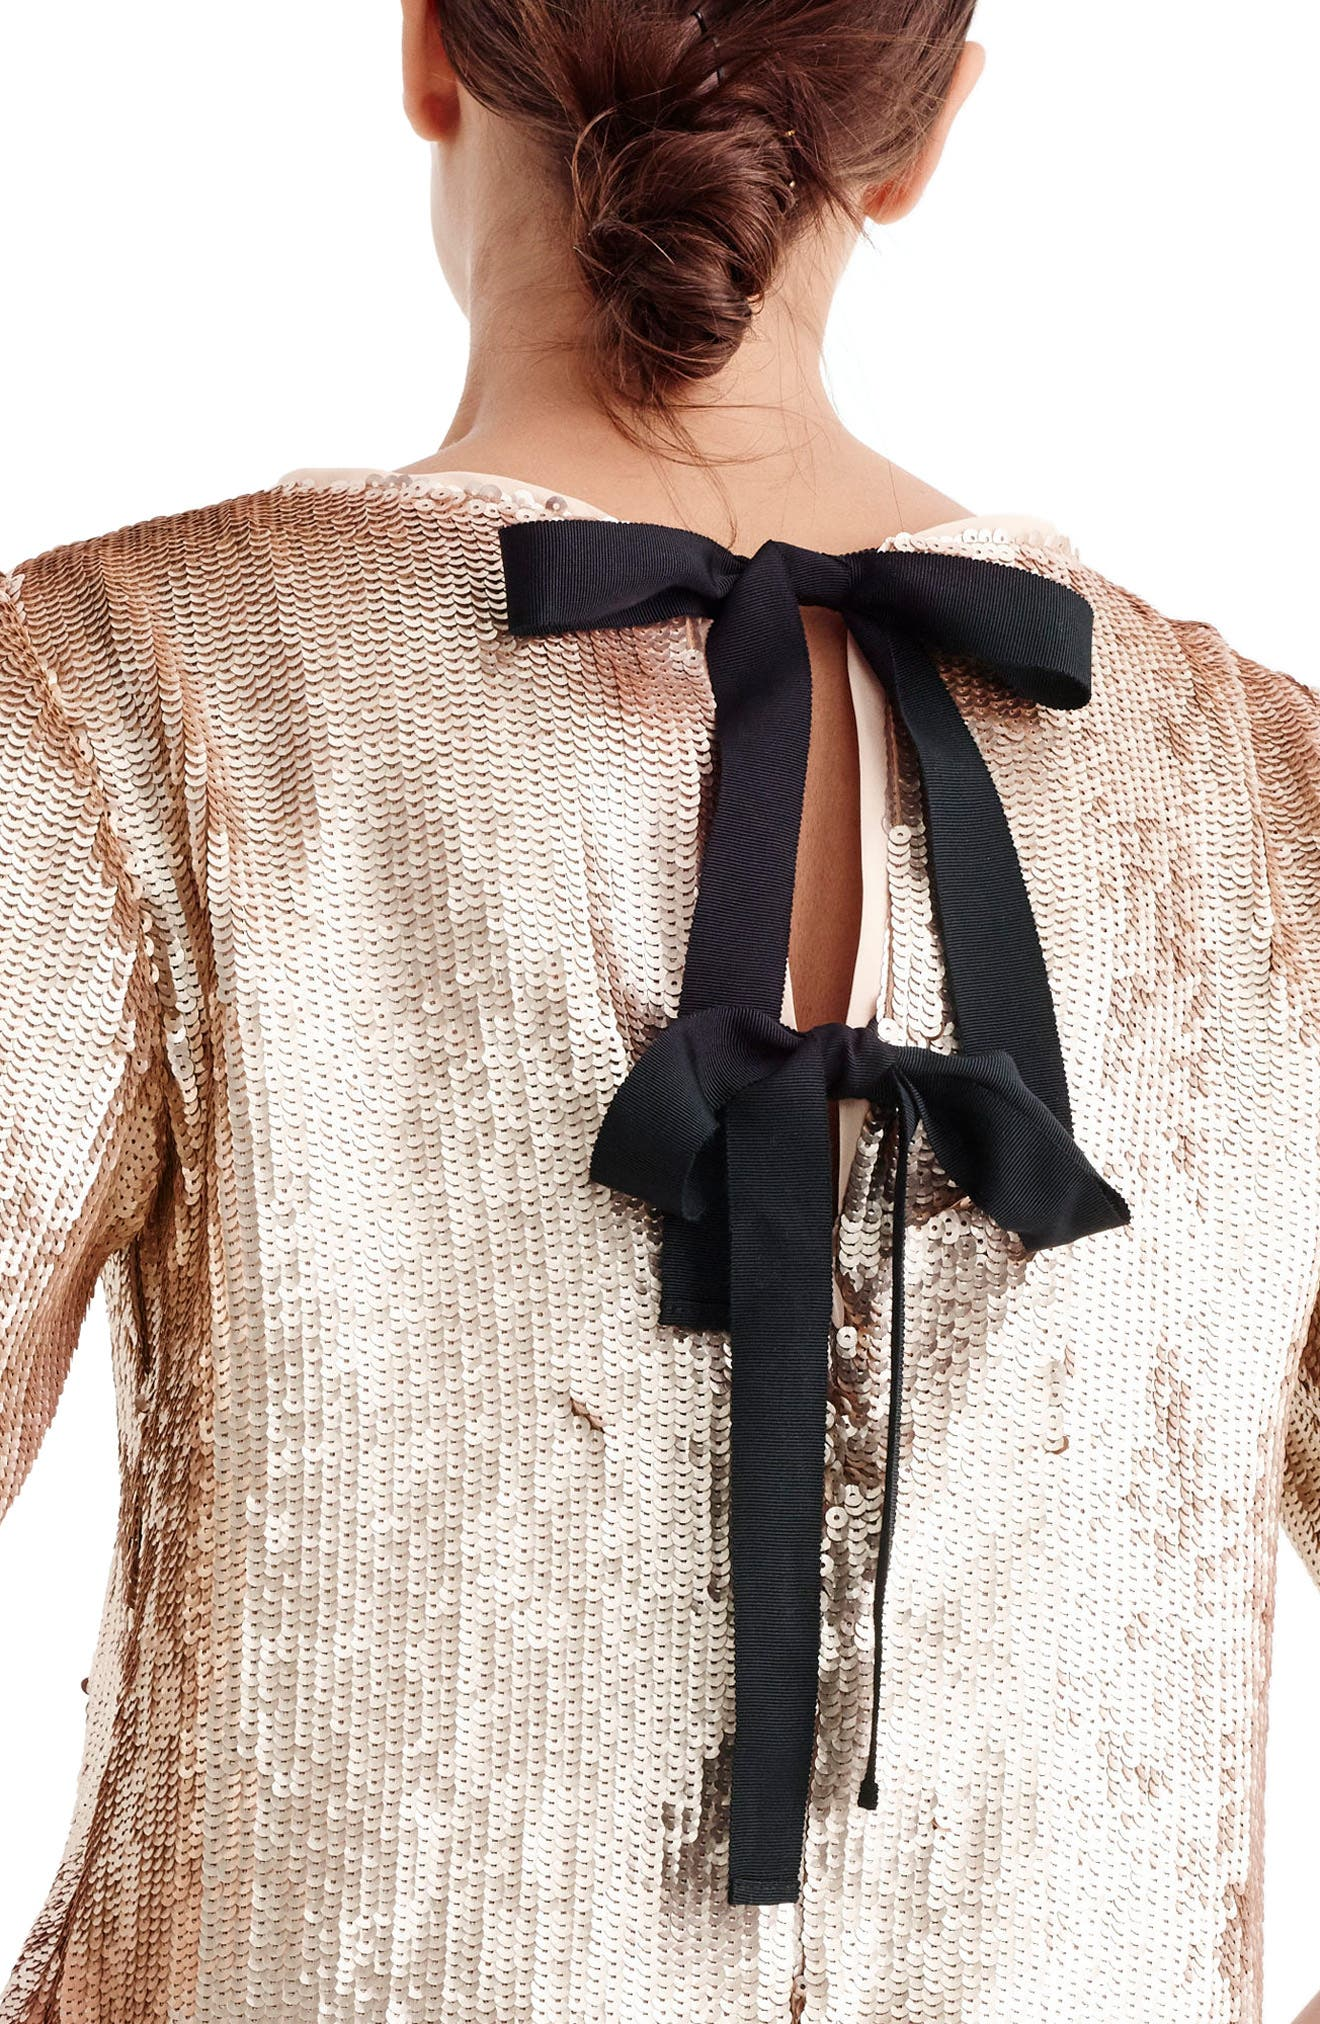 Rose Gold Sequin Crop Top,                             Alternate thumbnail 2, color,                             ROSE GOLD